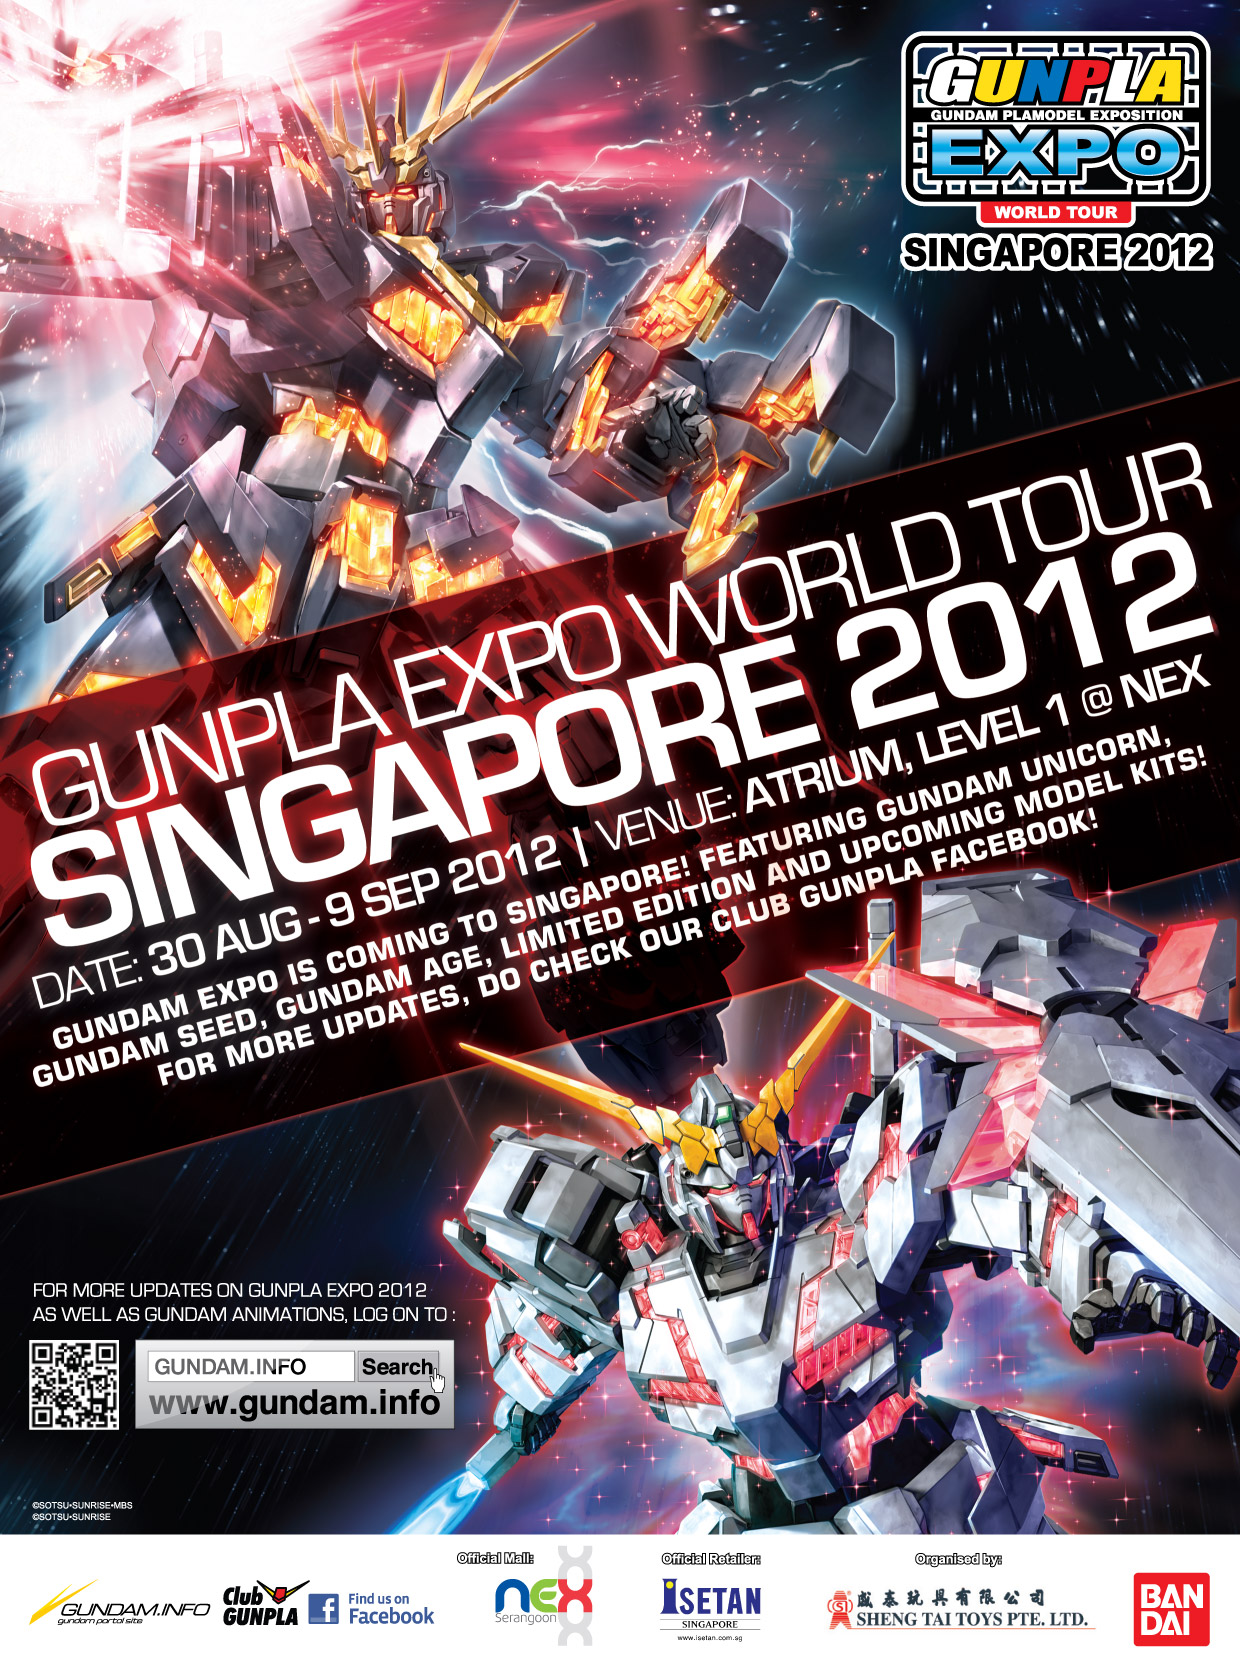 SG: Gundam Plamodel EXPO 2012